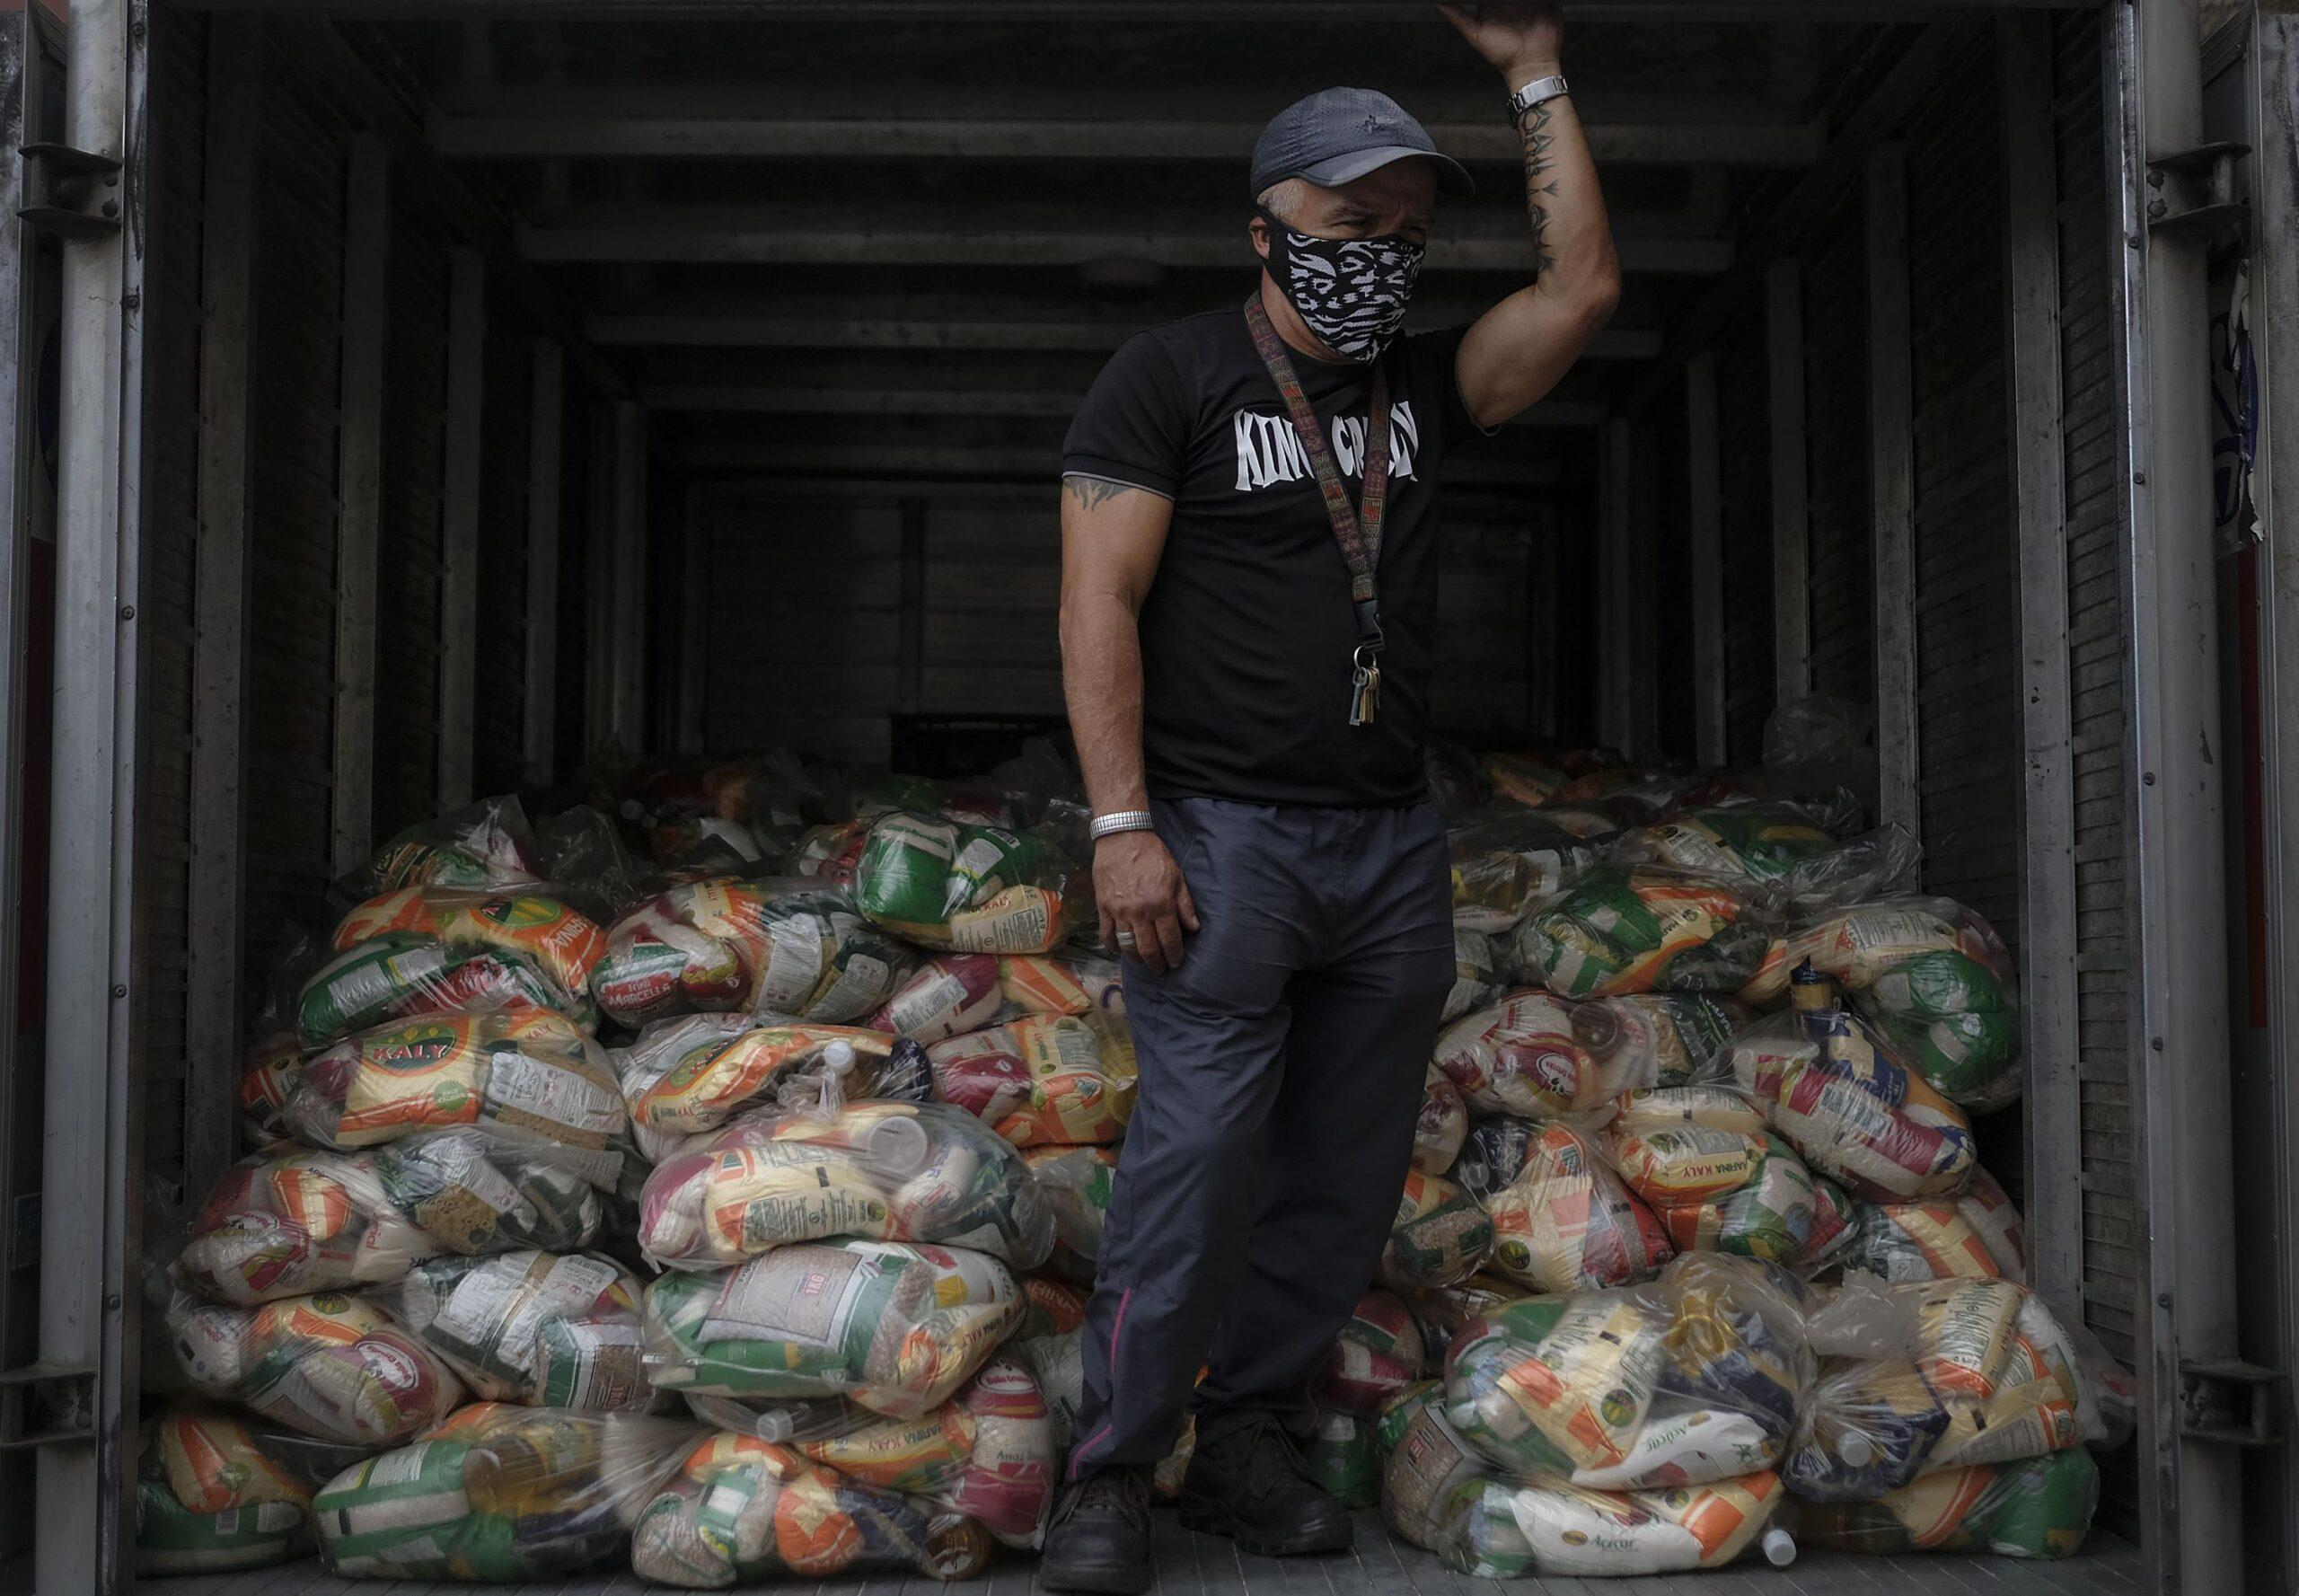 Venezuela's Maduro begins allowing aid against hunger, virus